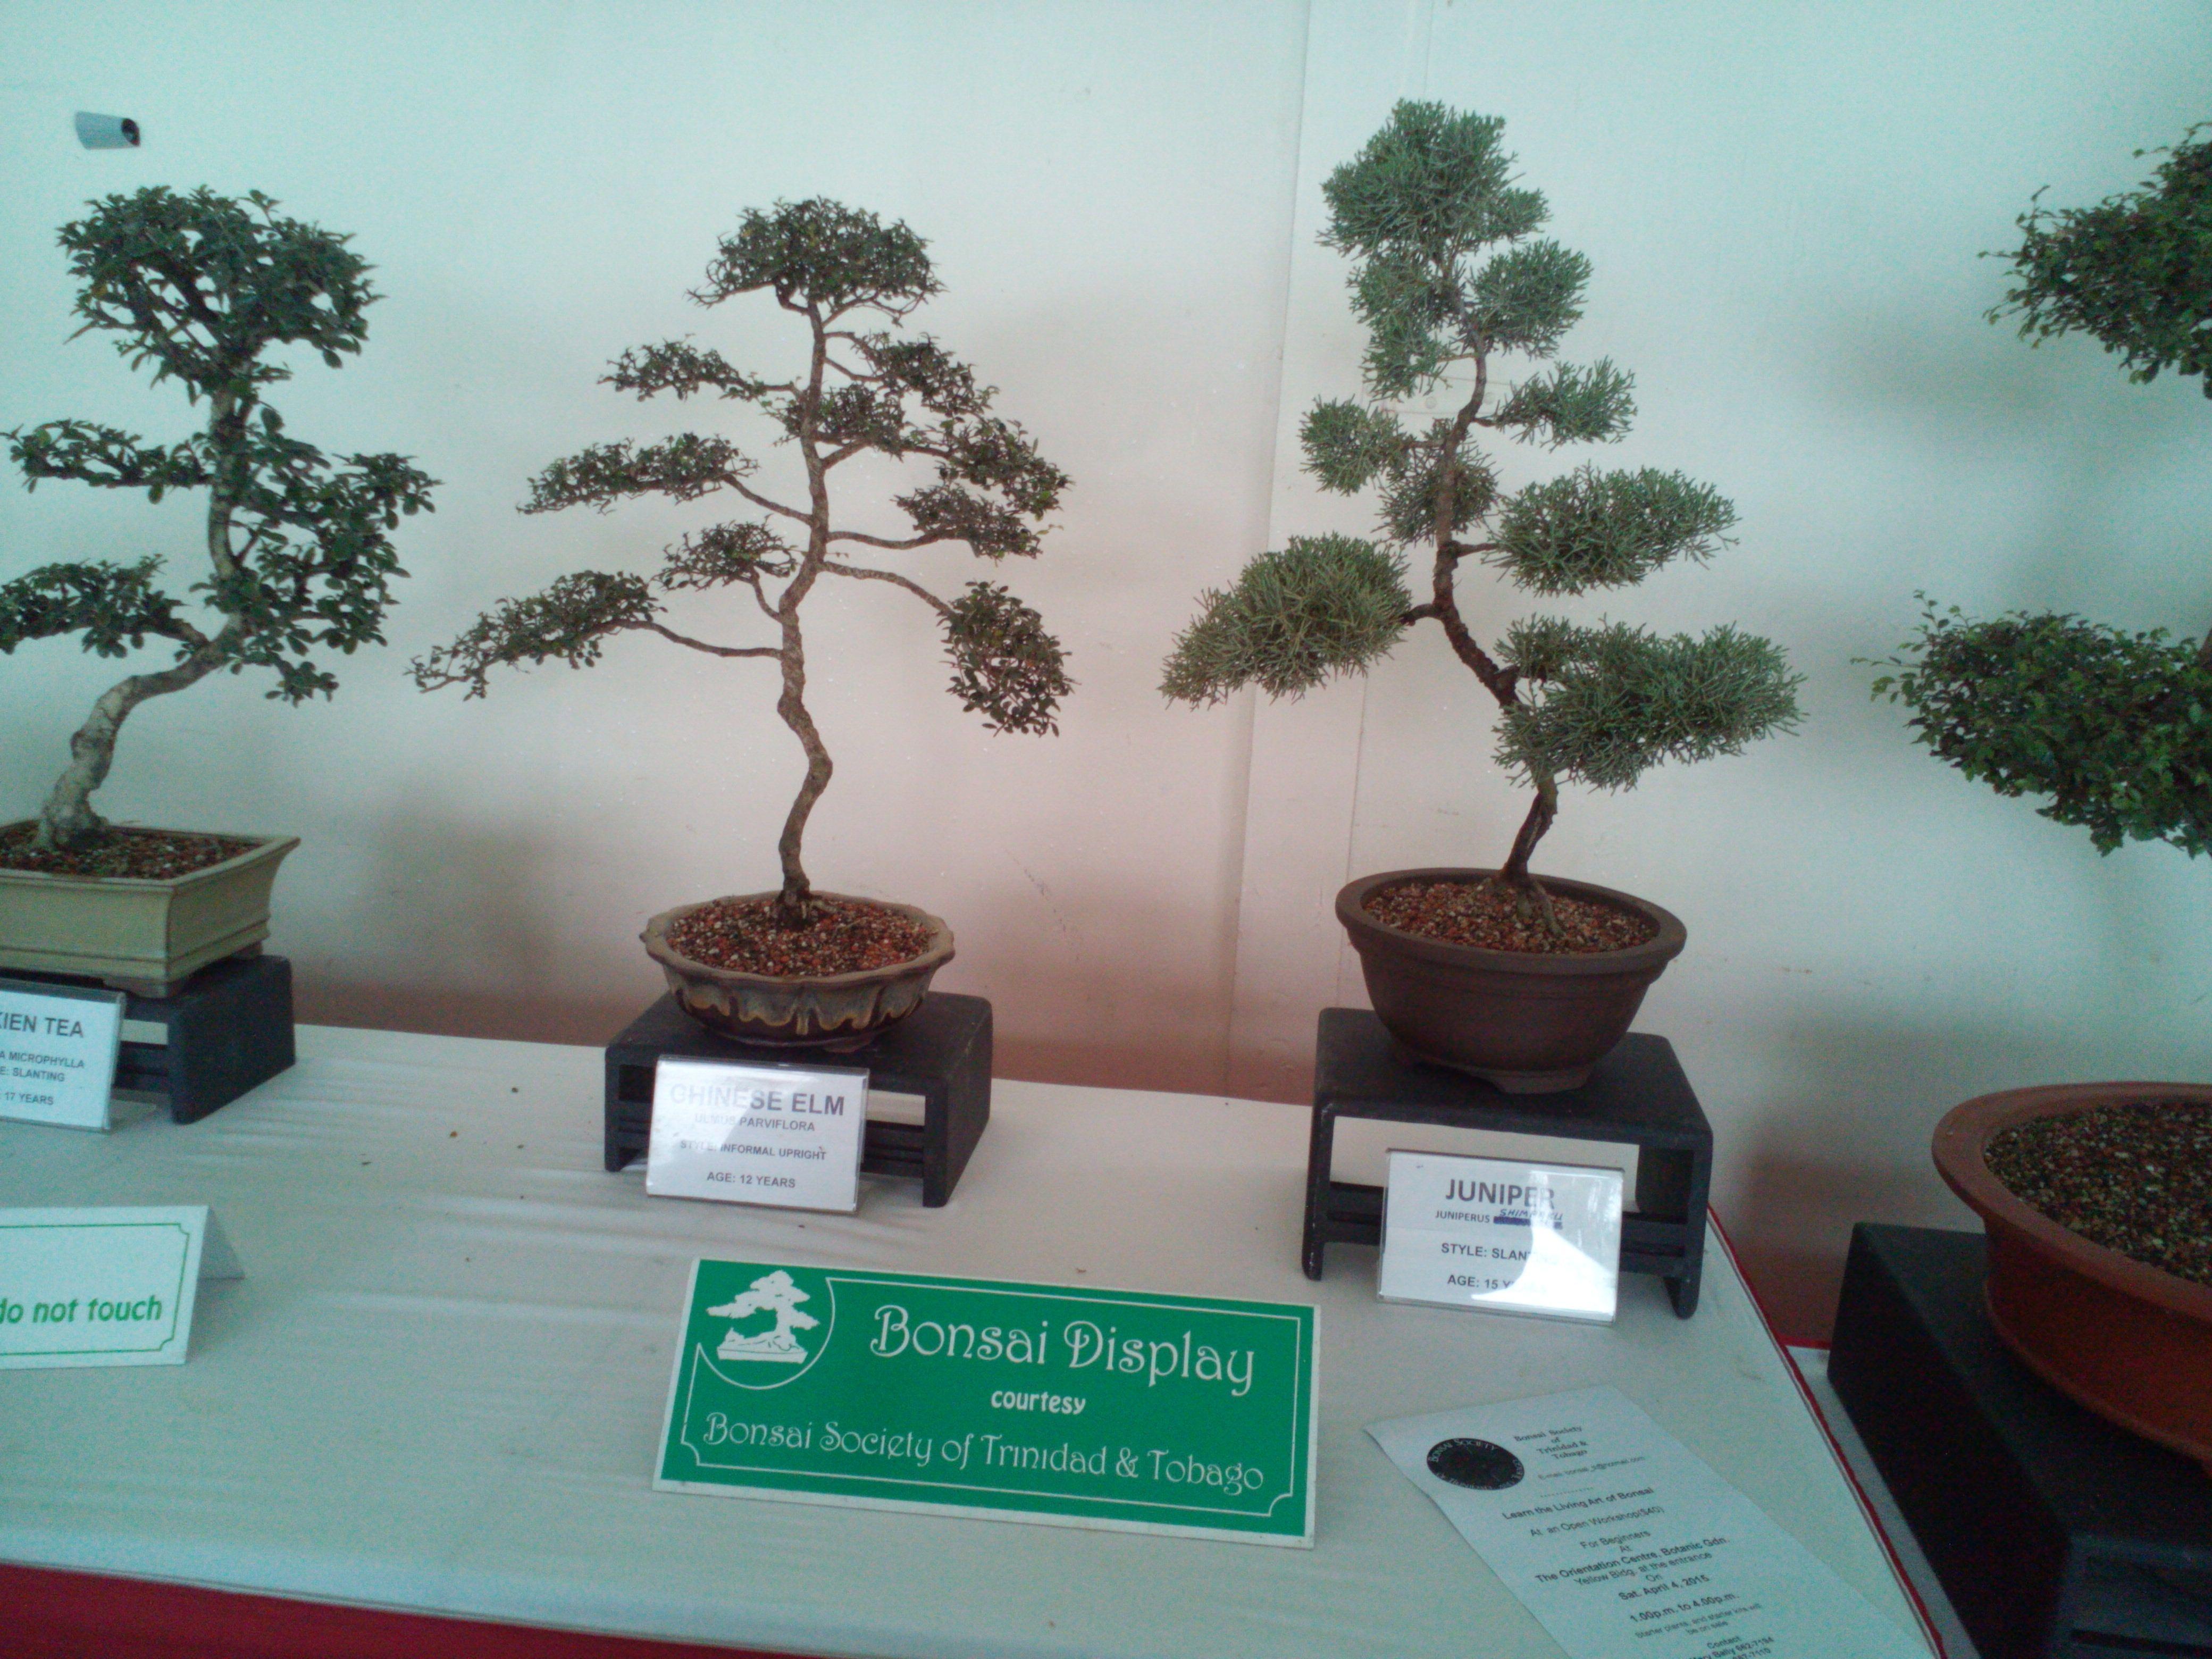 Bonsai Trees For Sale In Trinidad Bonsai Tree